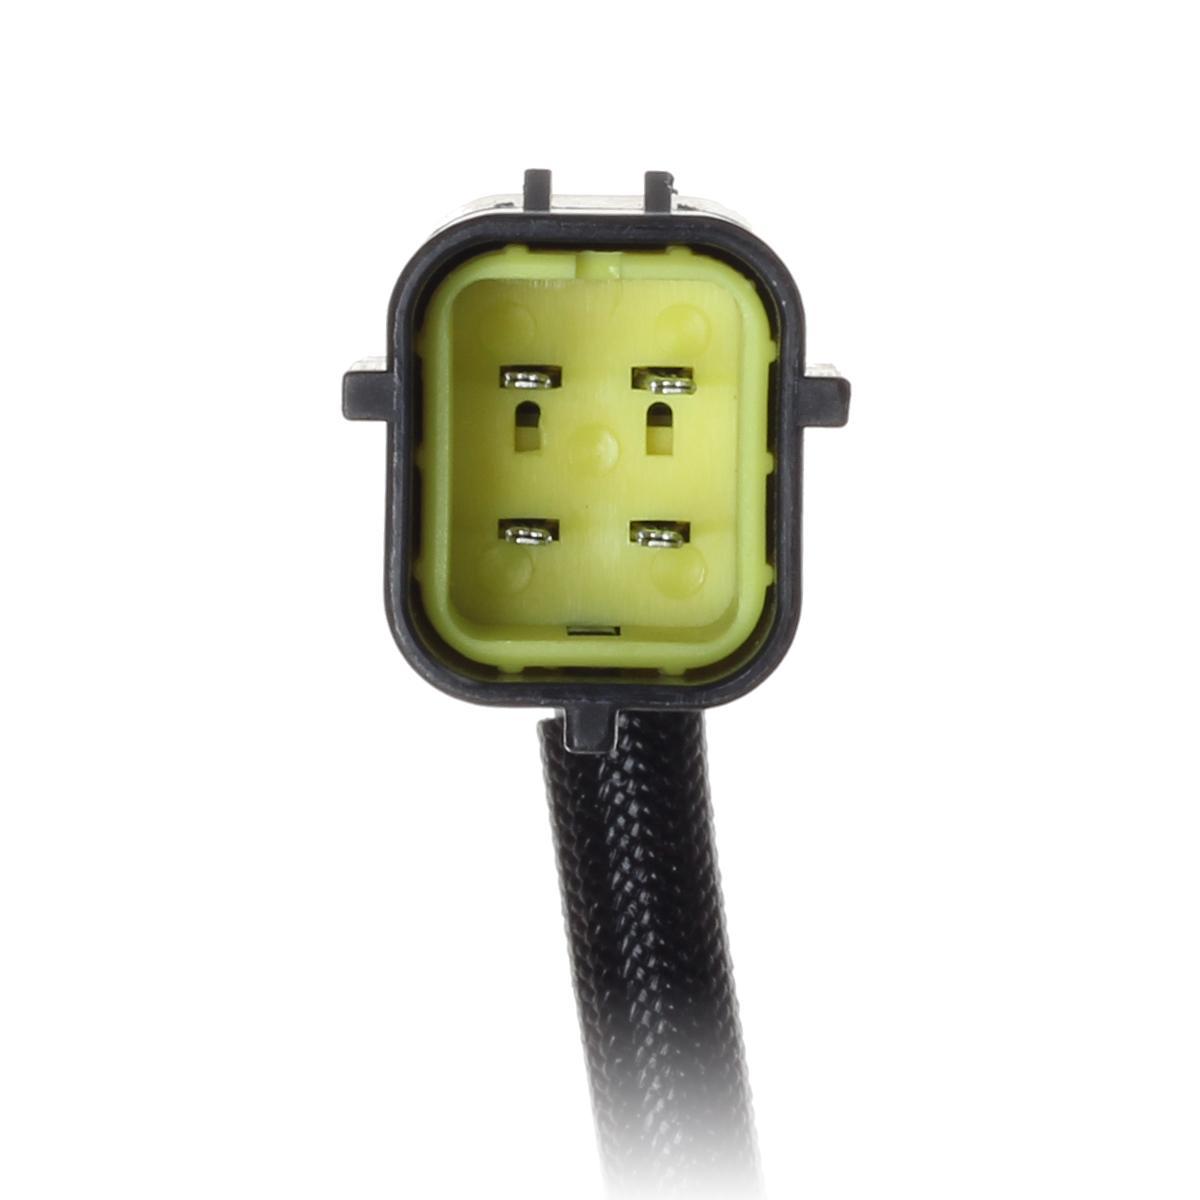 Mitsubishi Outlander Stereo Wiring Diagram furthermore Watch further P 0996b43f803812fb besides 2003 Montero Sport 3 0l Po401 Egr 48929 moreover Mitsubishi Pajero Fuse Box Translation Efcaviation. on mitsubishi montero sport wiring diagram